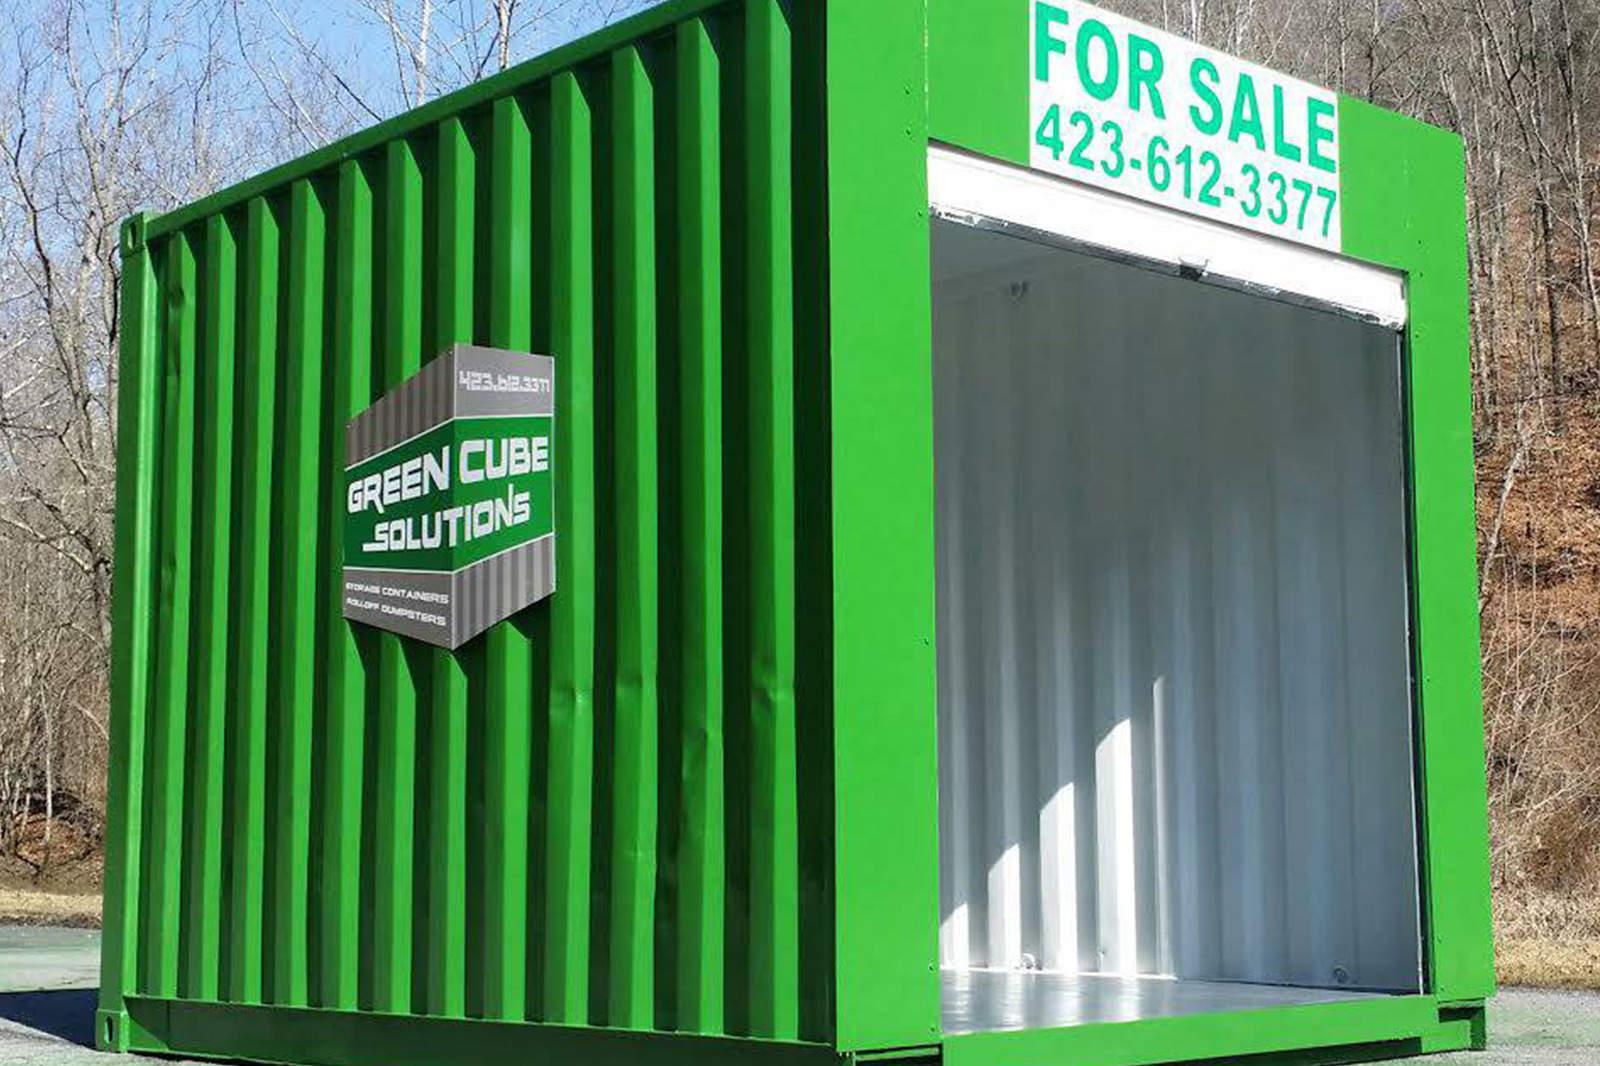 Dumpster Rental by Green Cube Solutions - Bristol TN - Kingsport TN